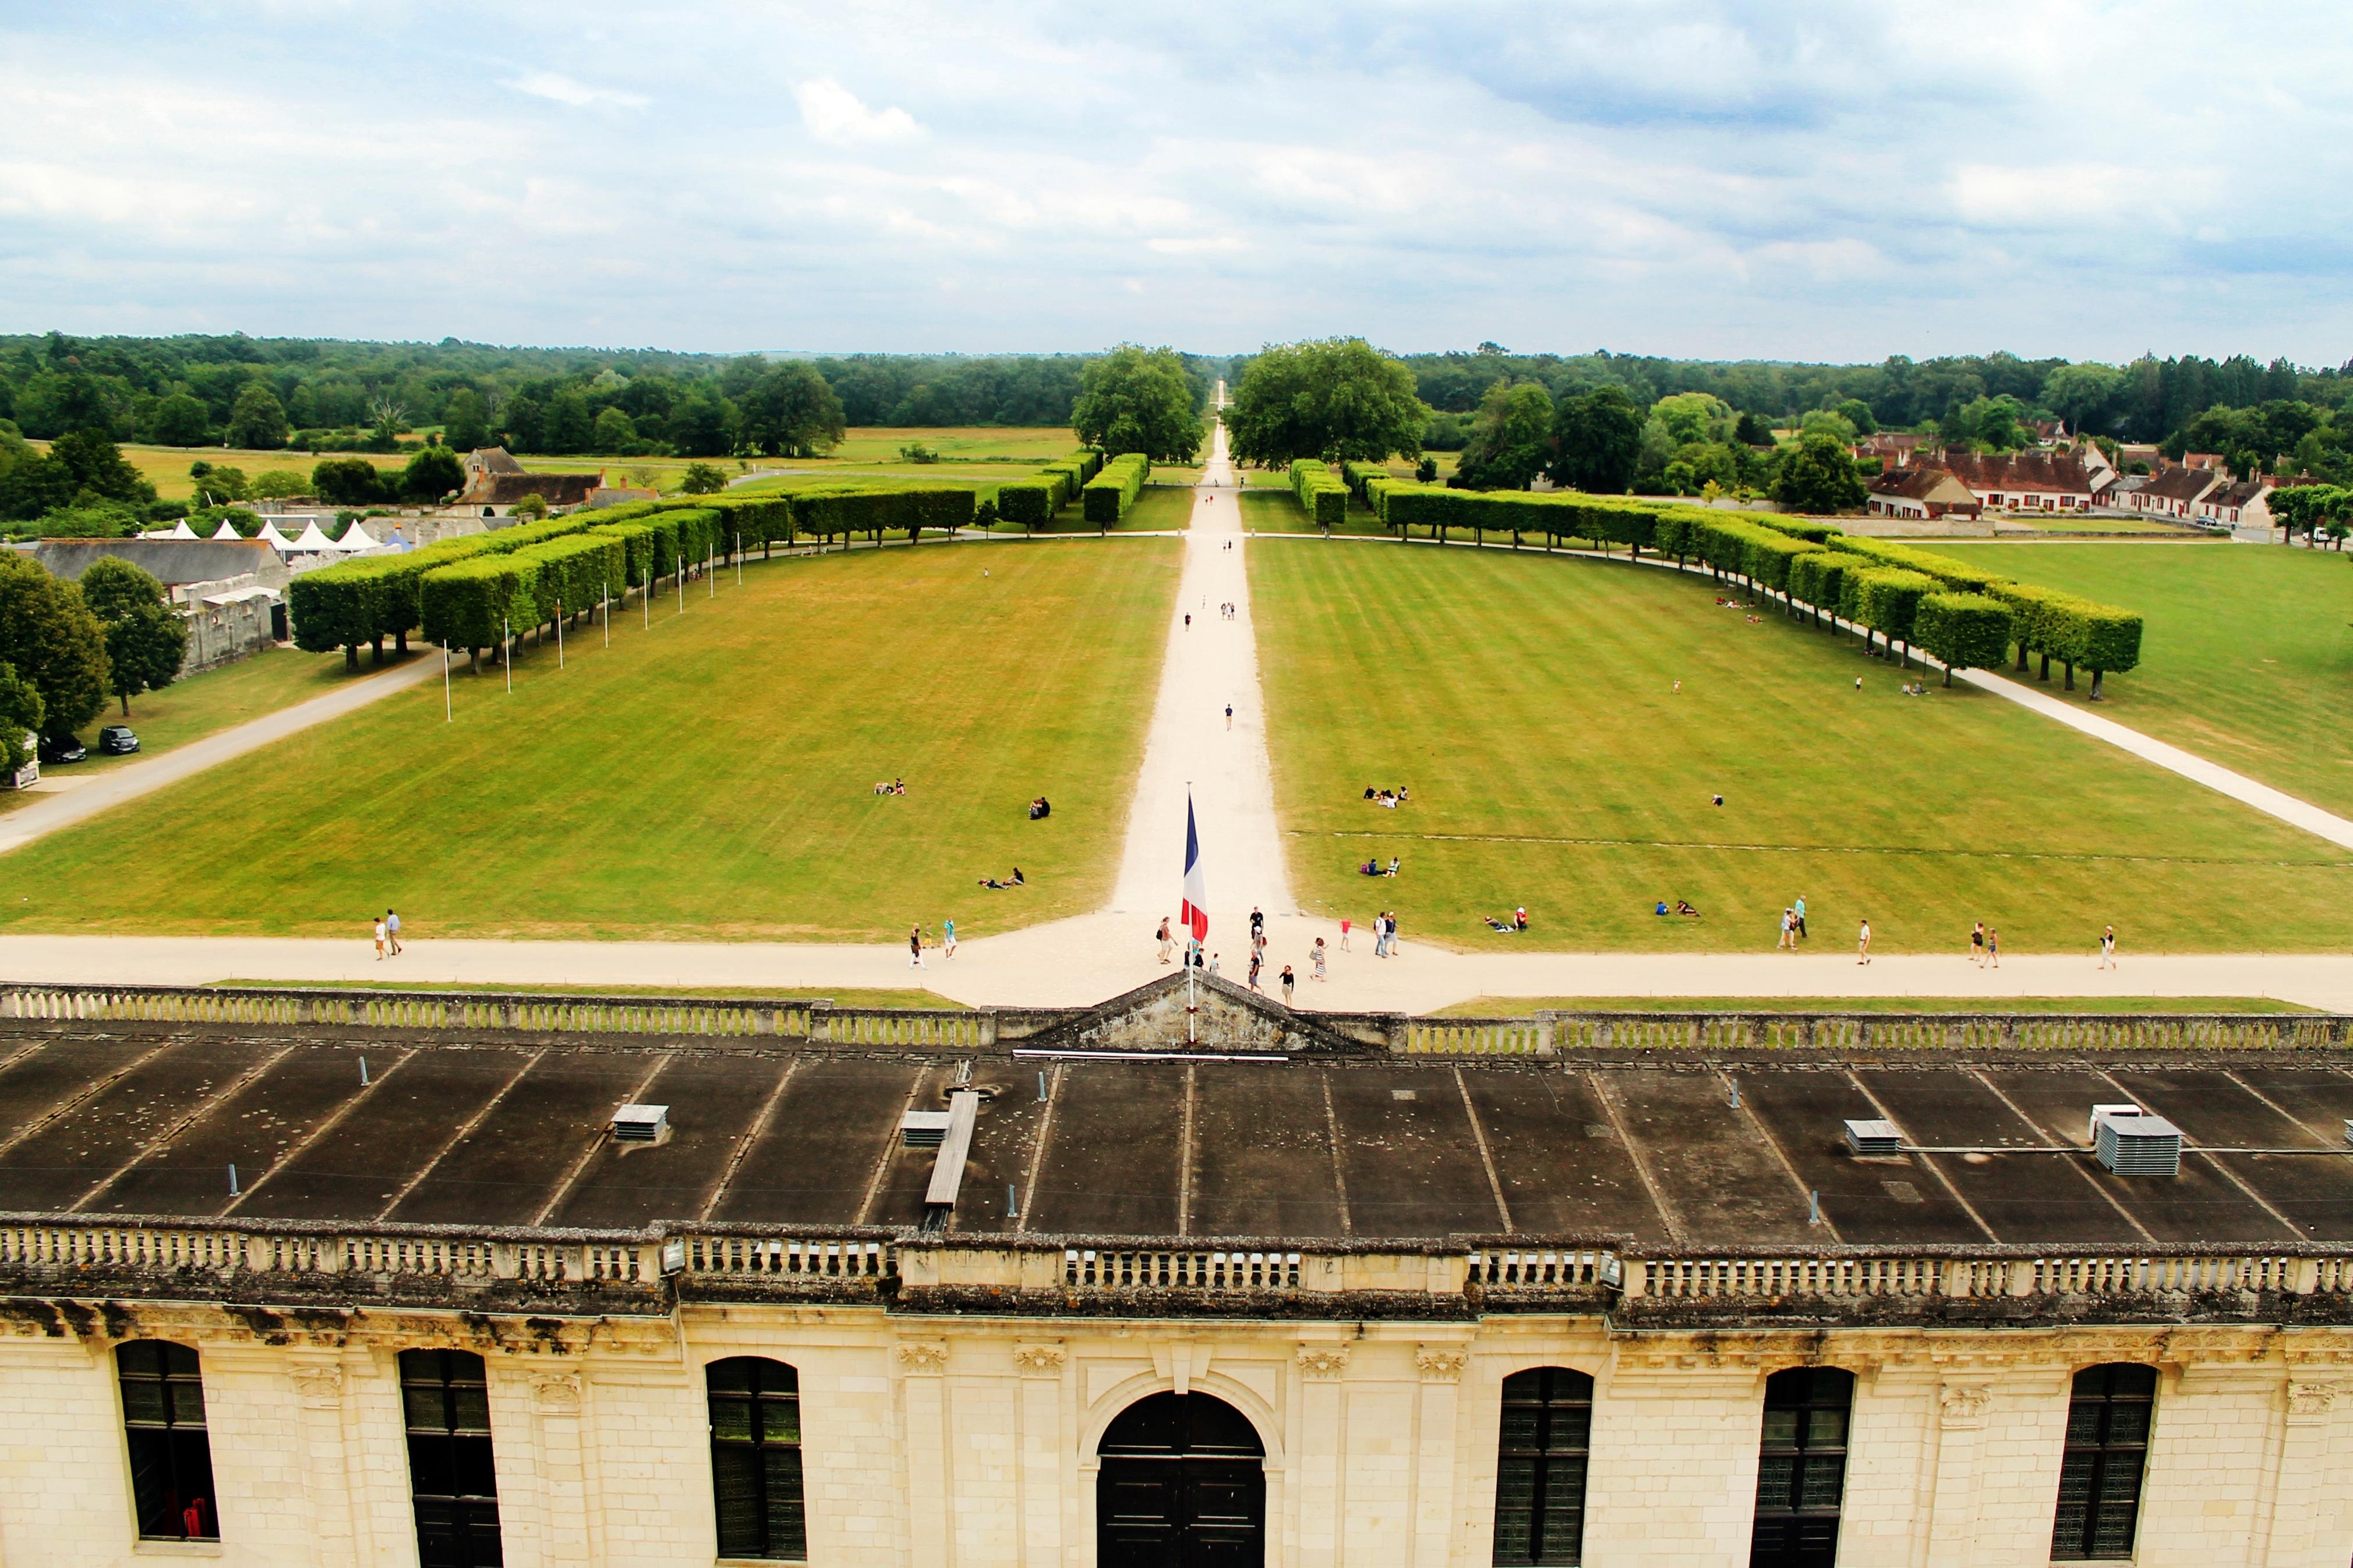 Visita ao Château de Chambord, Vale do Loire